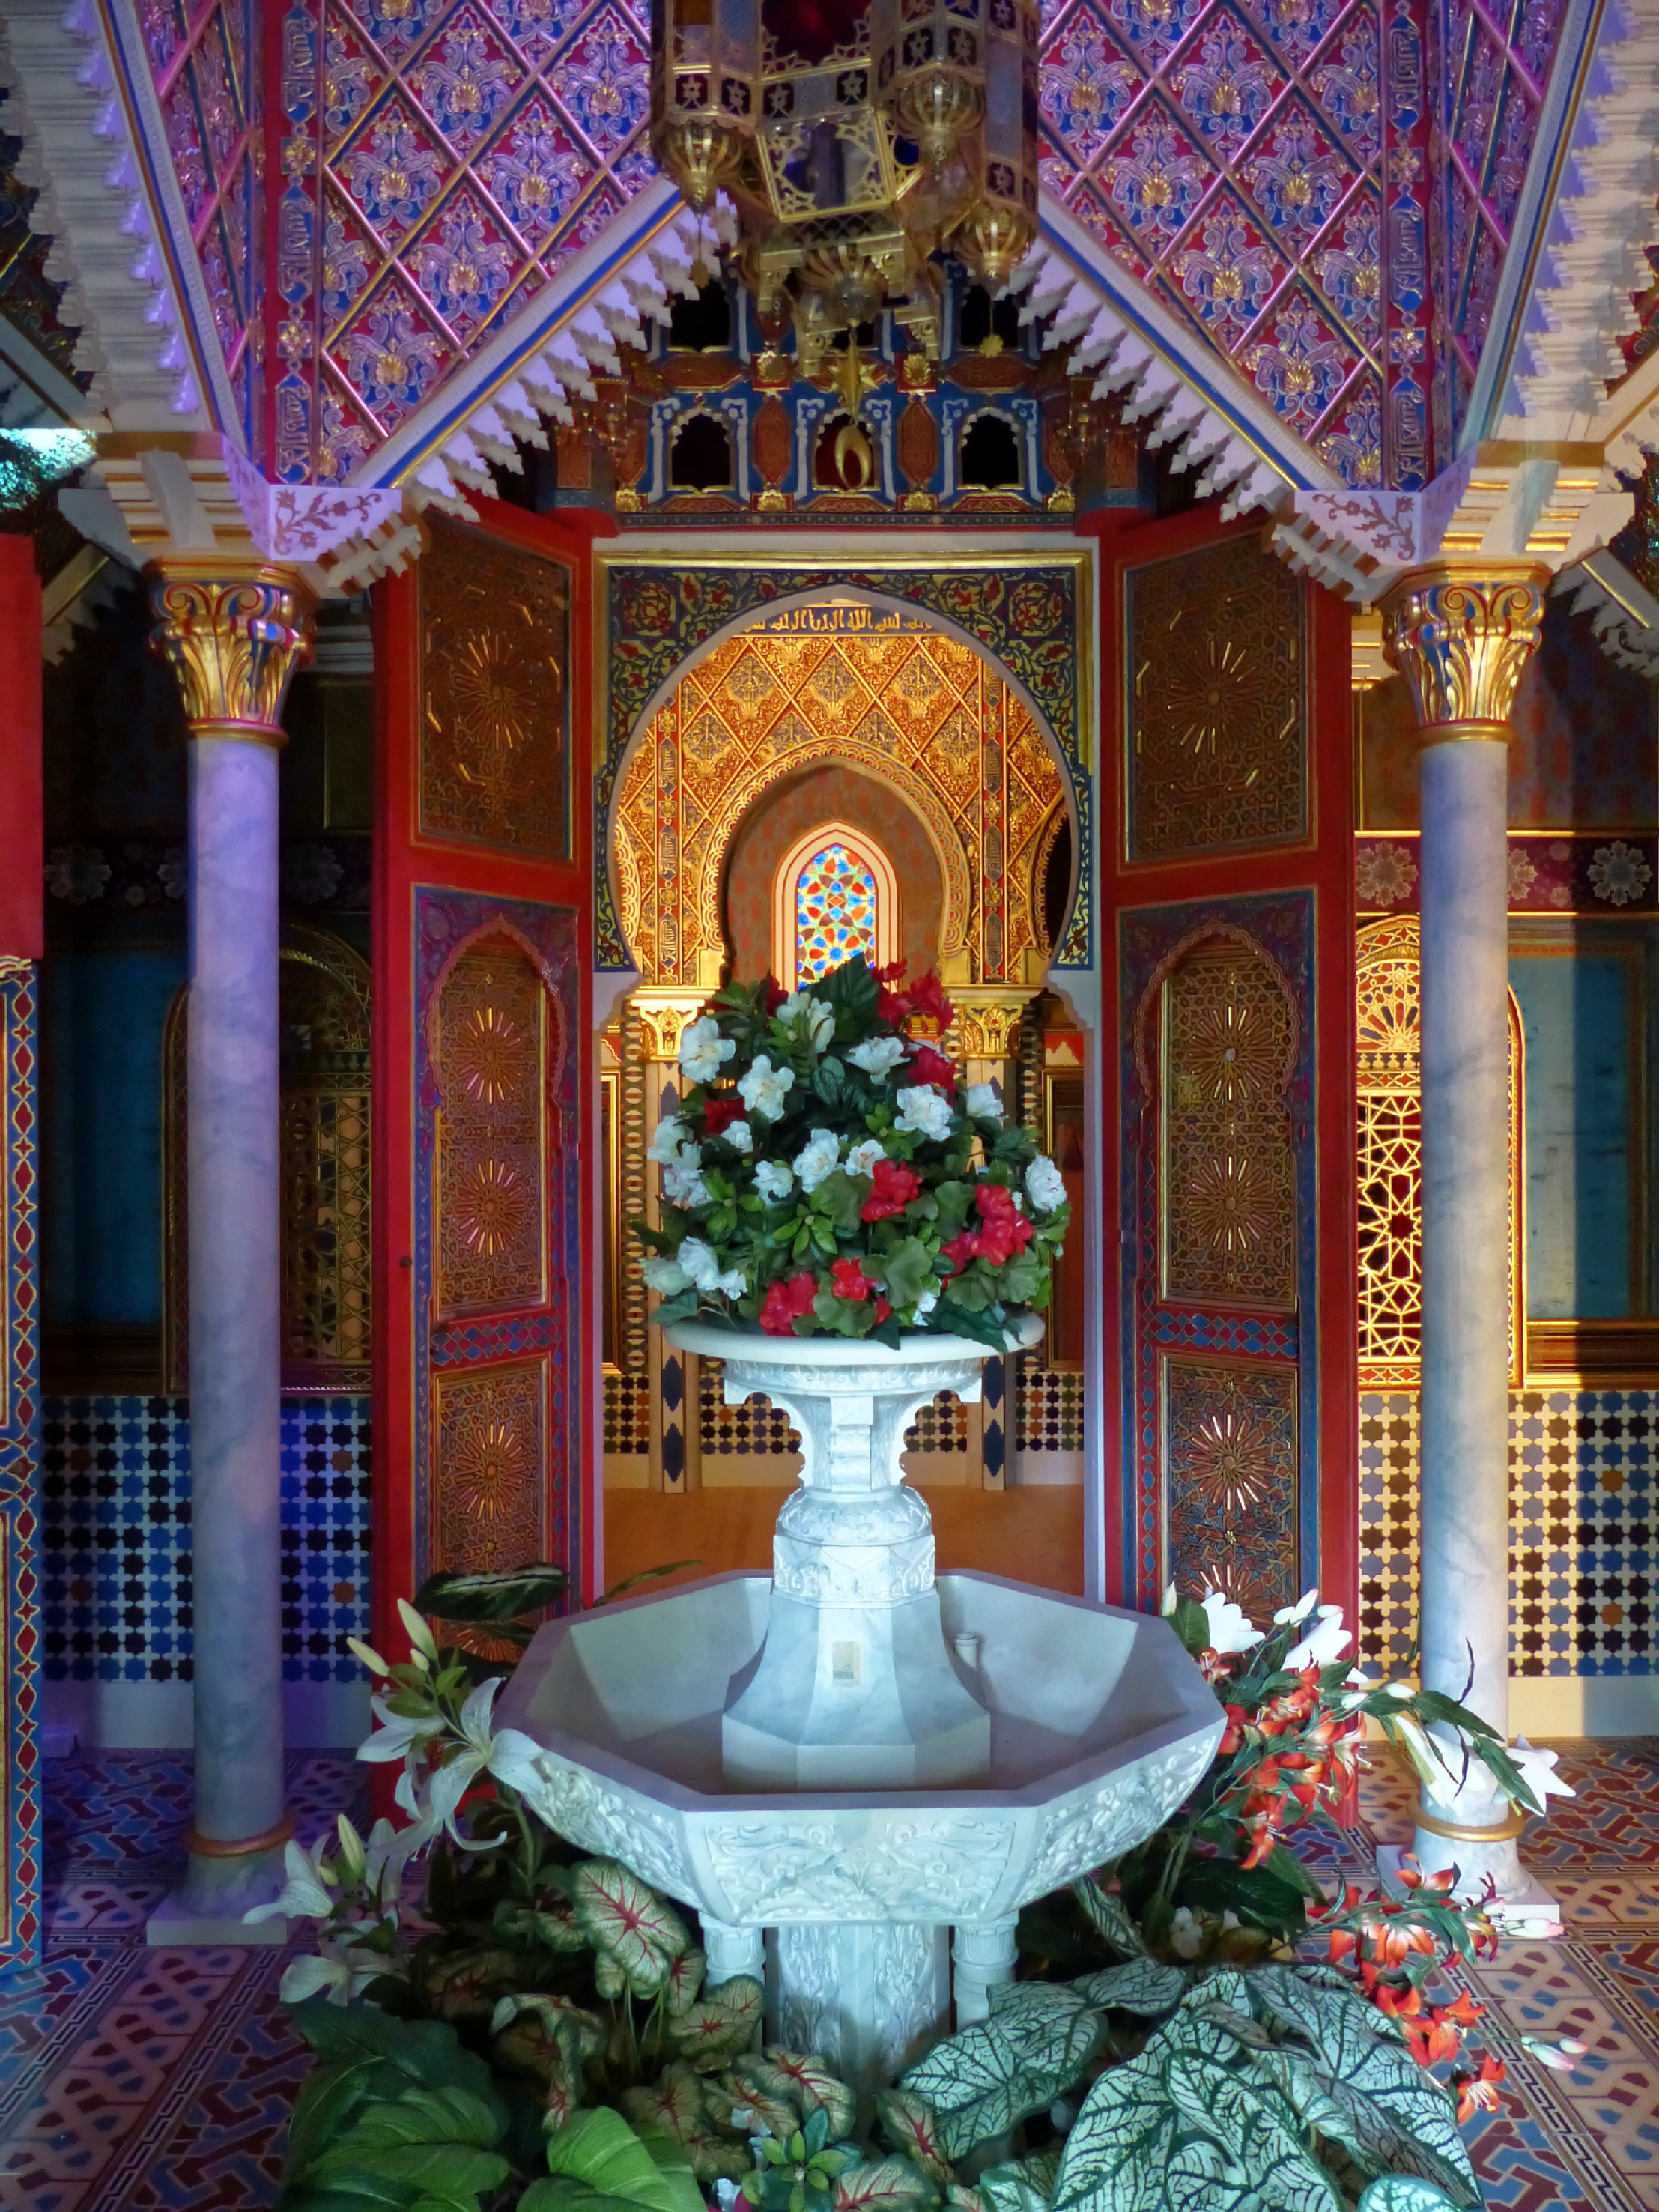 File:Linderhof Marokkanisches Haus Interieur.jpg - Wikimedia Commons